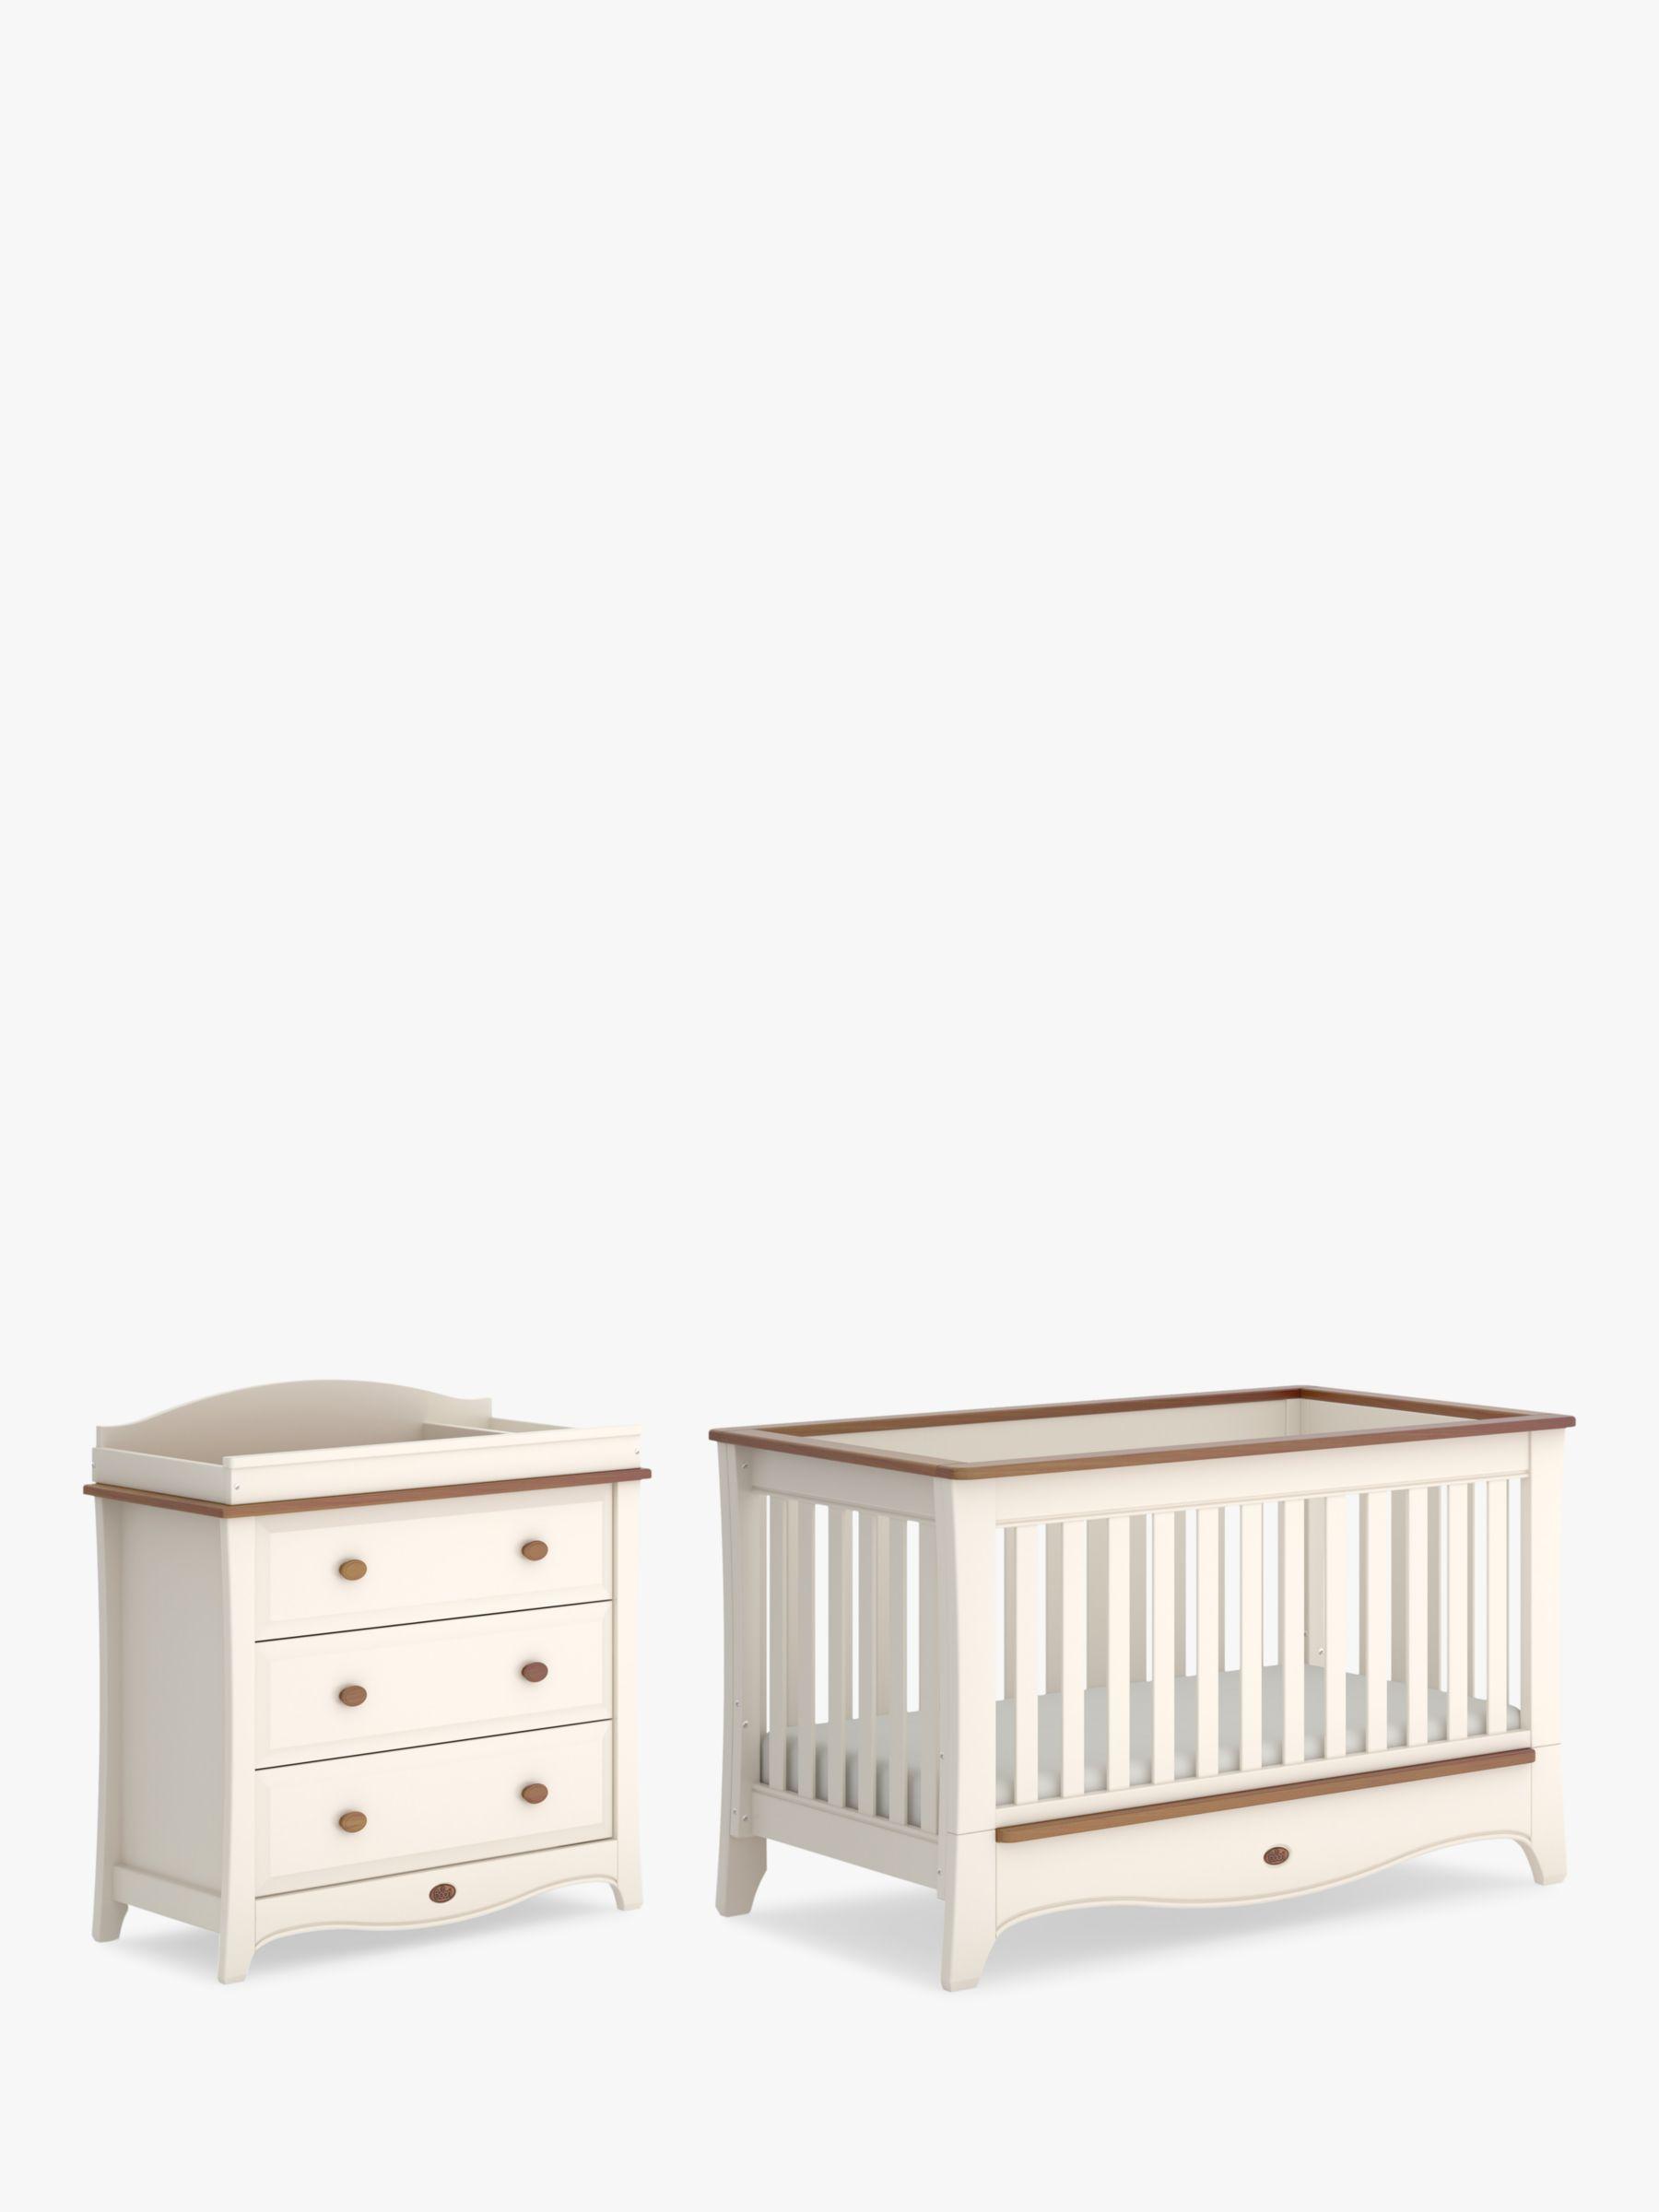 Boori Boori Provence Convertible Plus Cotbed & 3 Drawer Dresser, Cream/Pecan